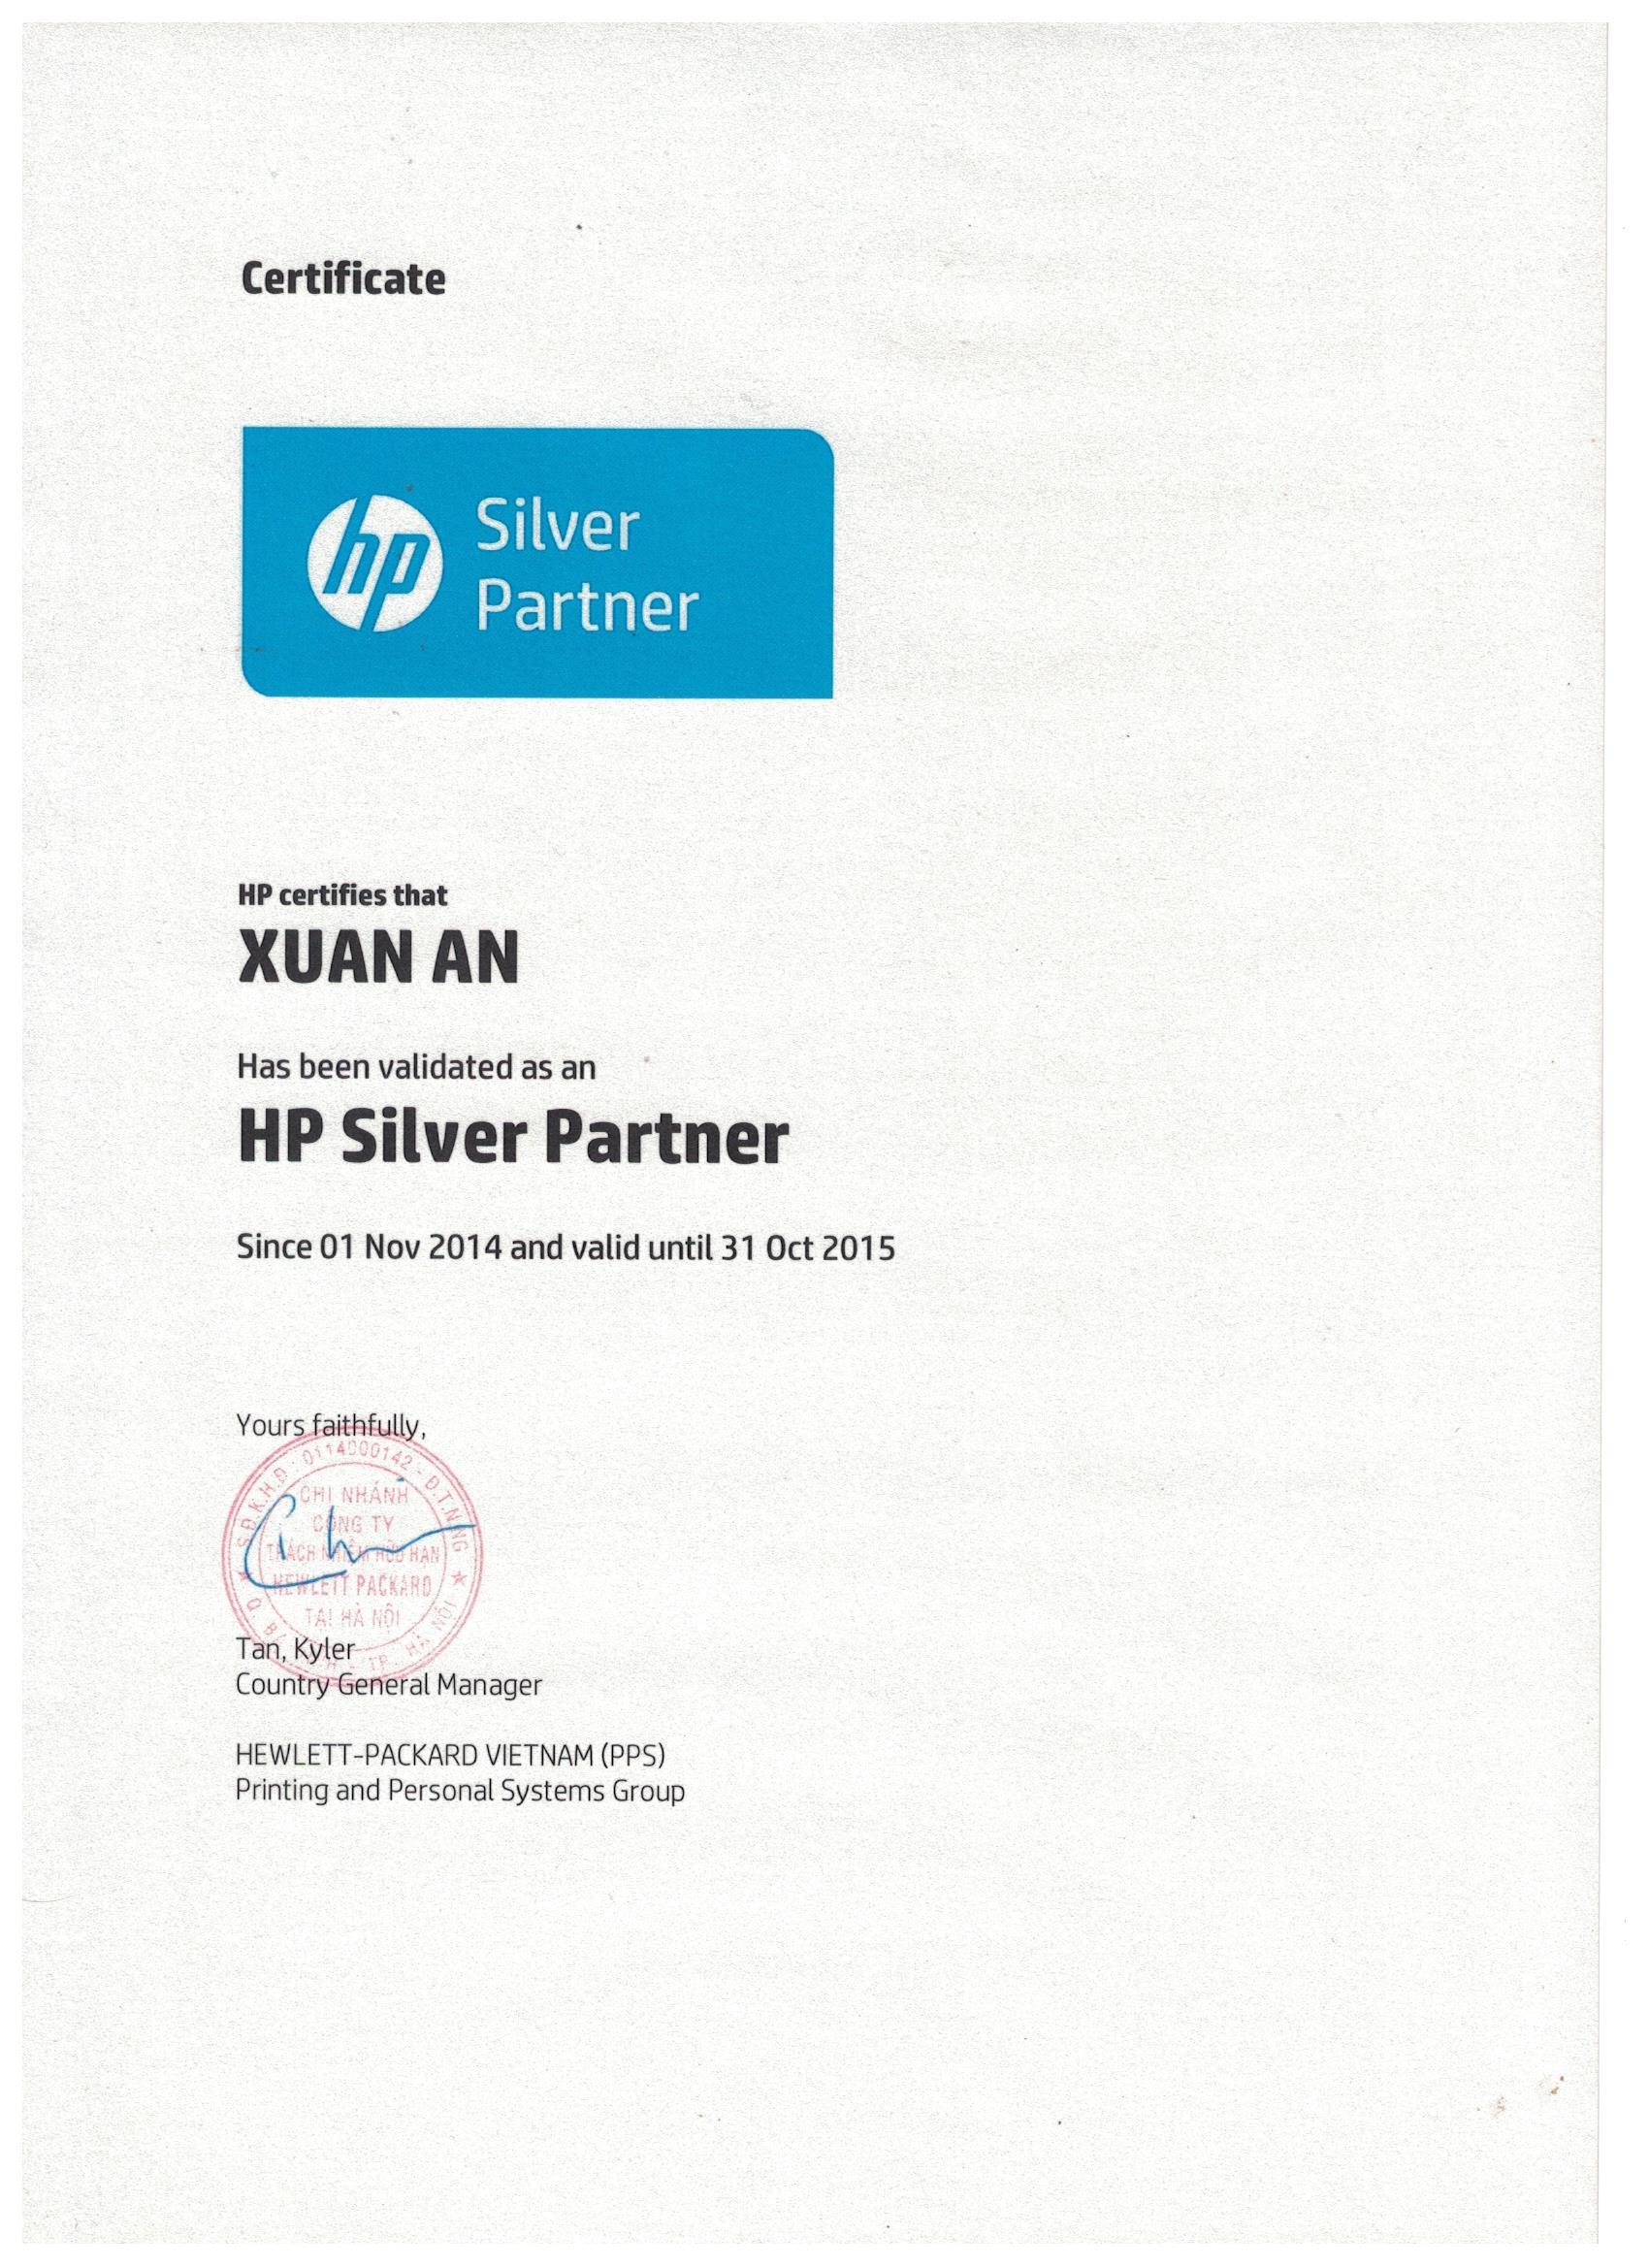 HP Probook 430 G6 - 5YM98PA (Silver)